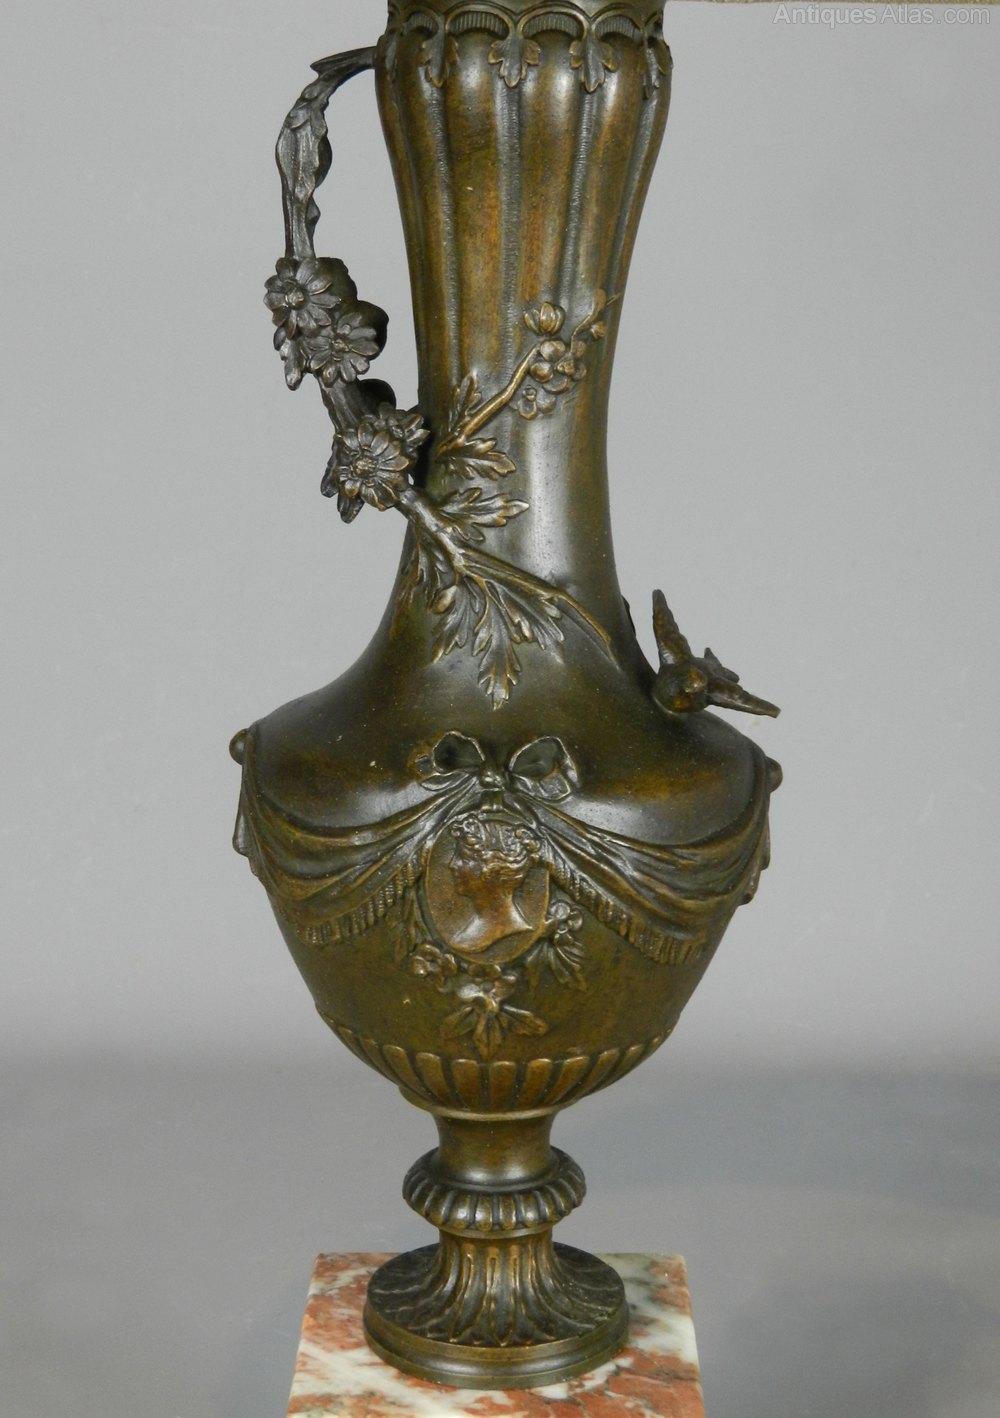 Antiques Atlas Decorative French Antique Table Lamp